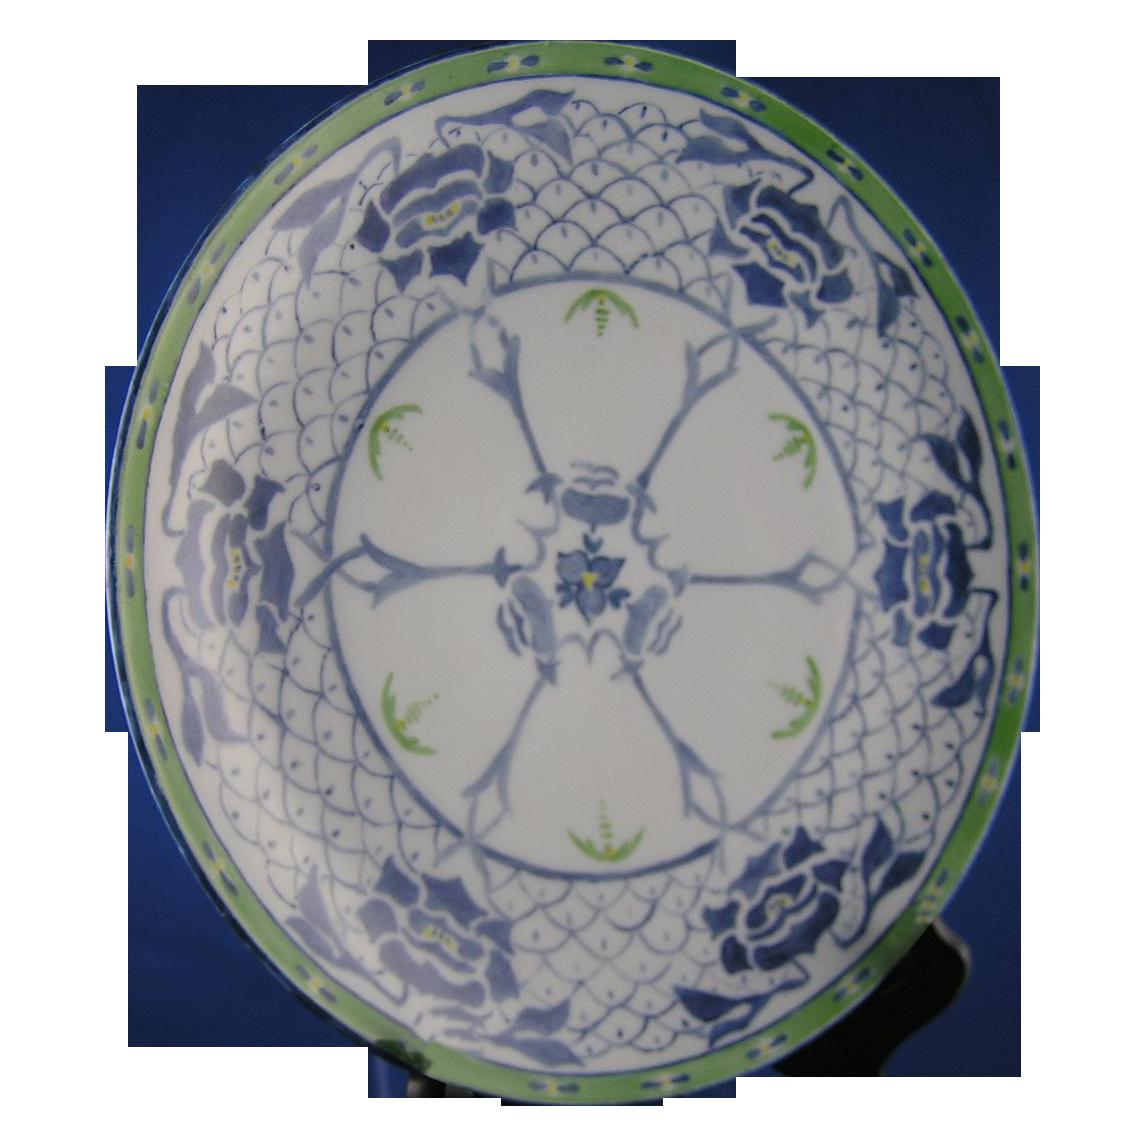 Oscar & Edgar Gutherz (O&EG) Austria Art Nouveau Plate (c.1899-1918)